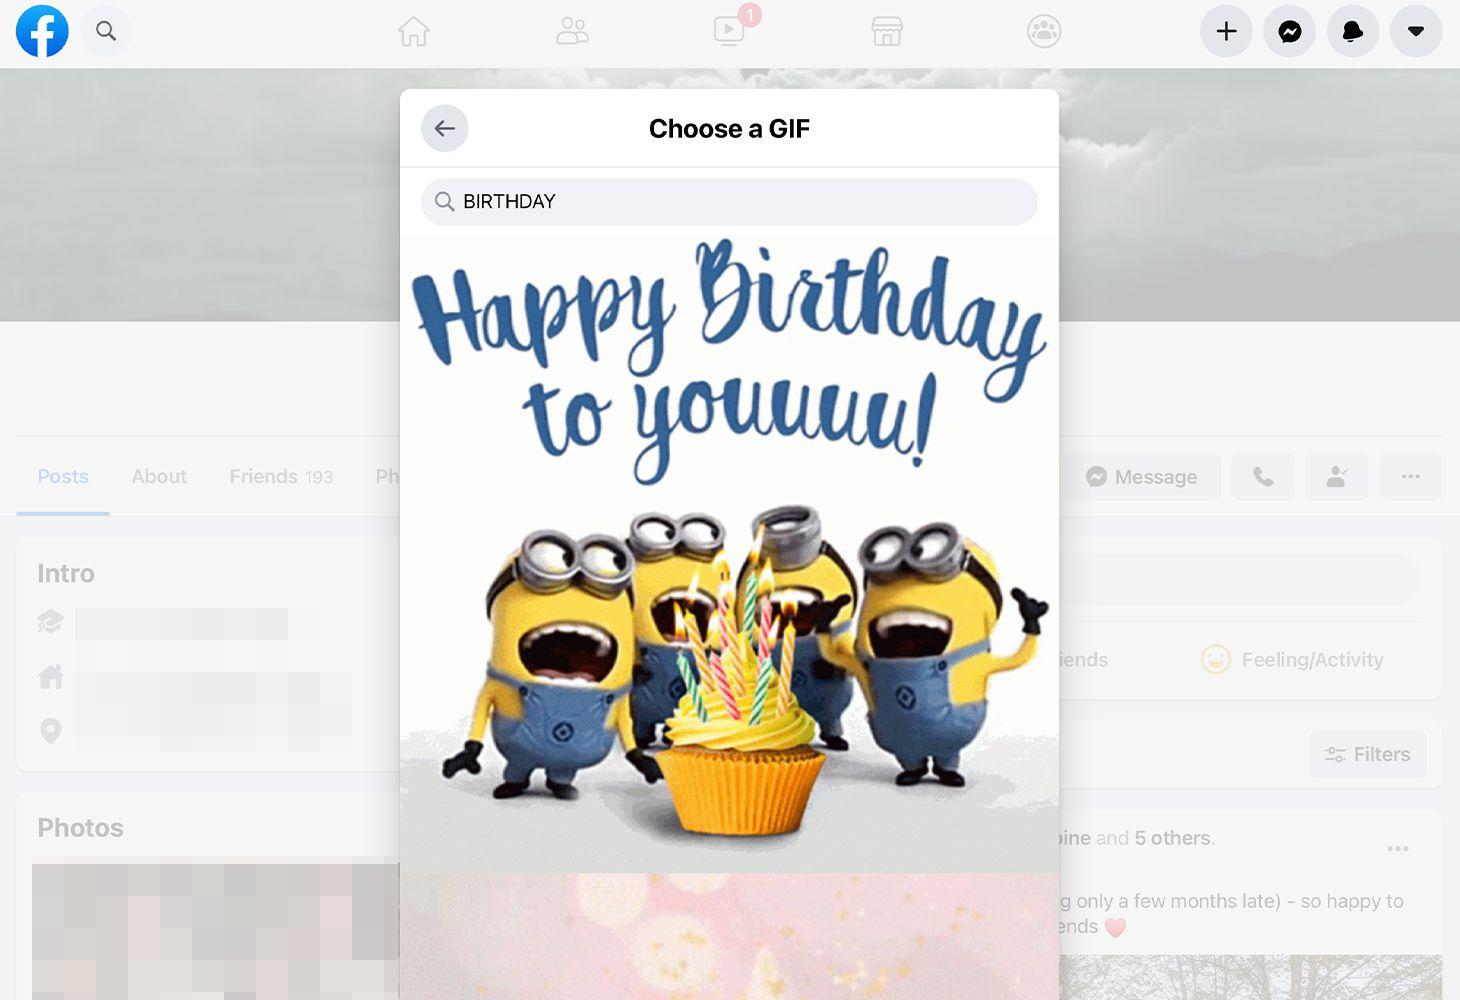 Happy Birthday GIF on Facebook